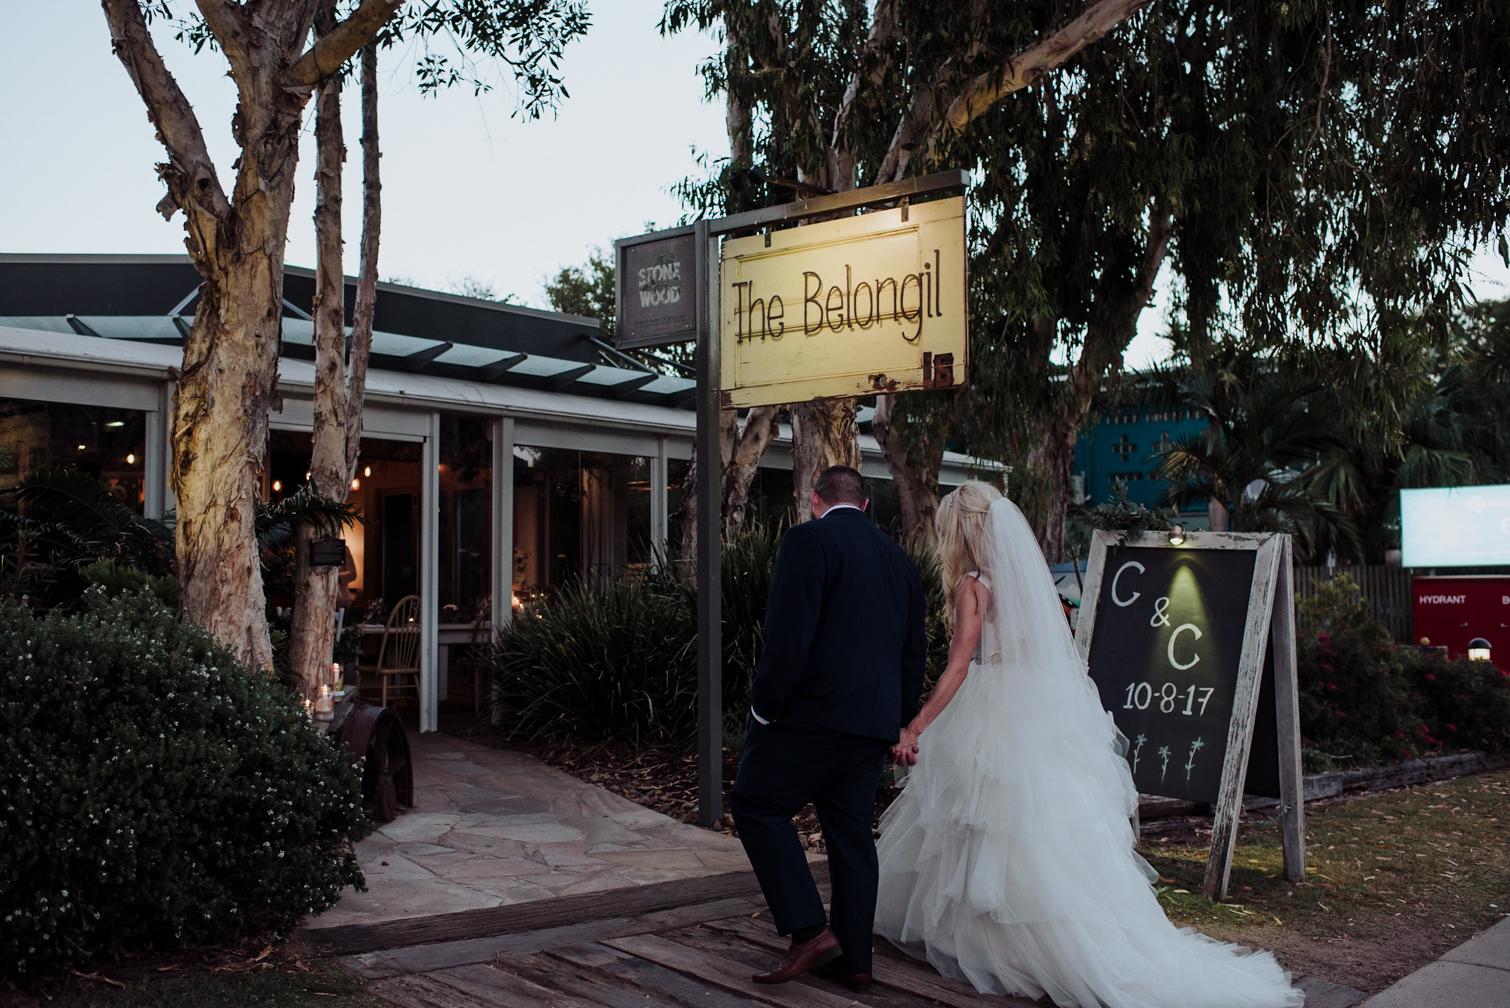 The_Belongil_Byron_Bay_Weddings_New_Black_Studios-179.jpg